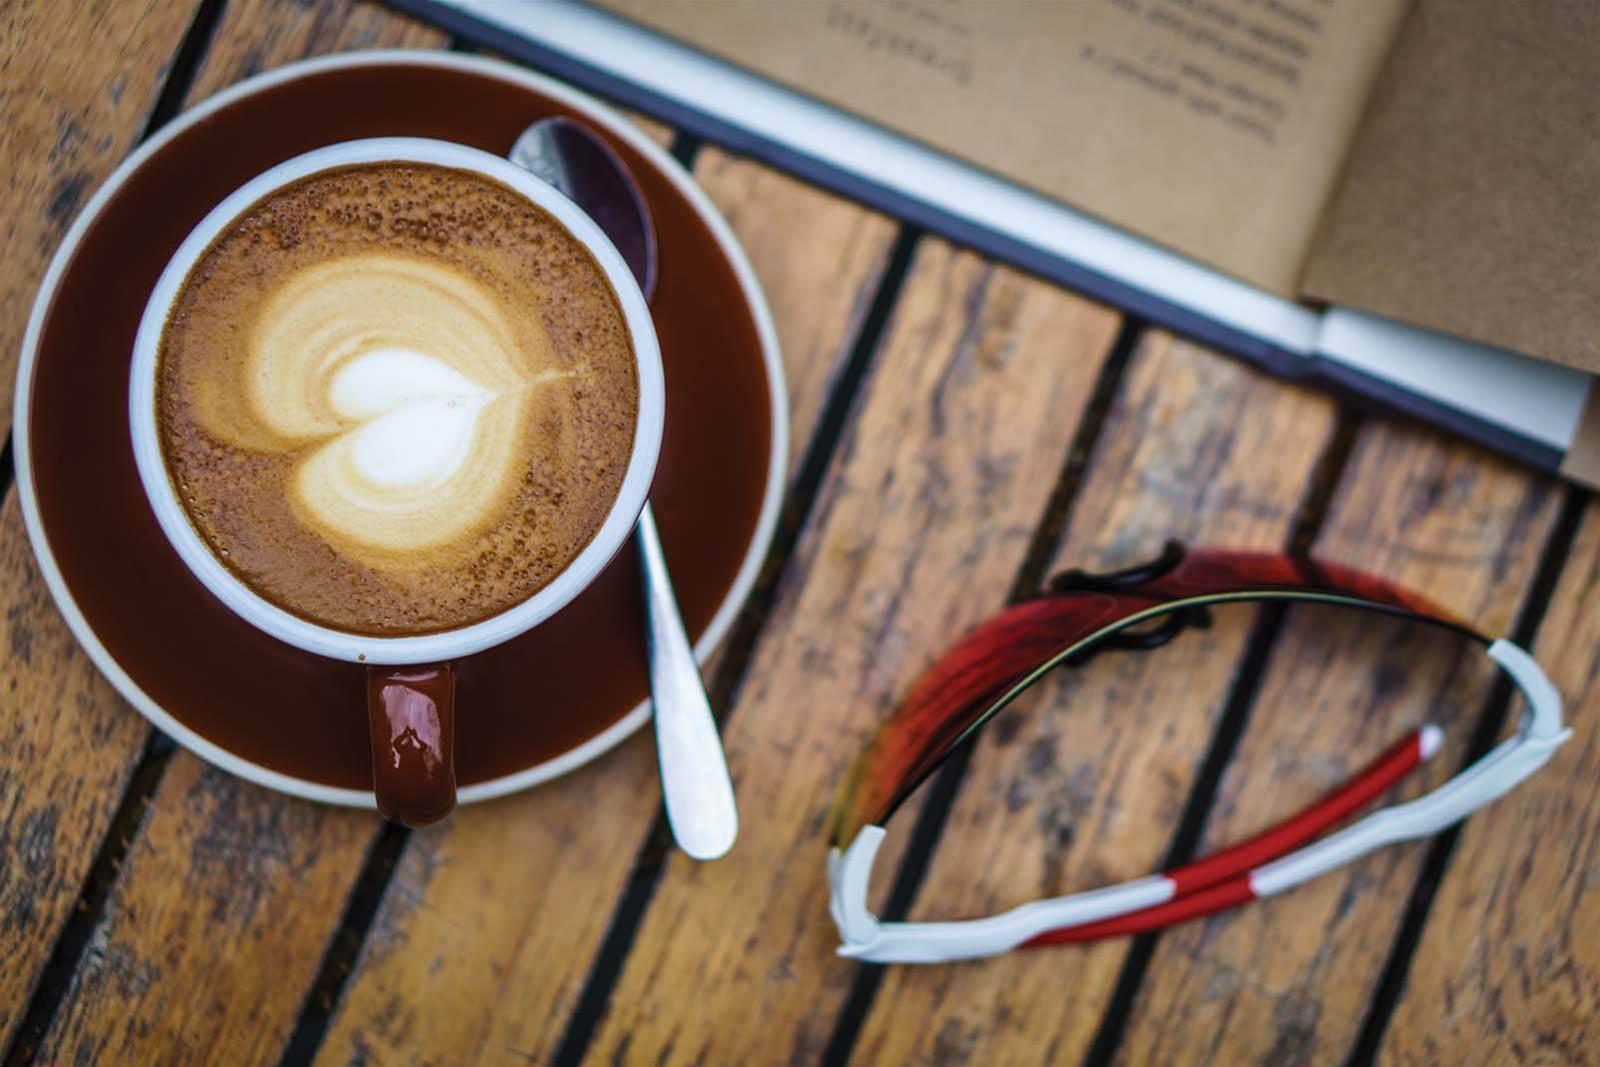 Brew review: Pieno, Surry Hills, Sydney